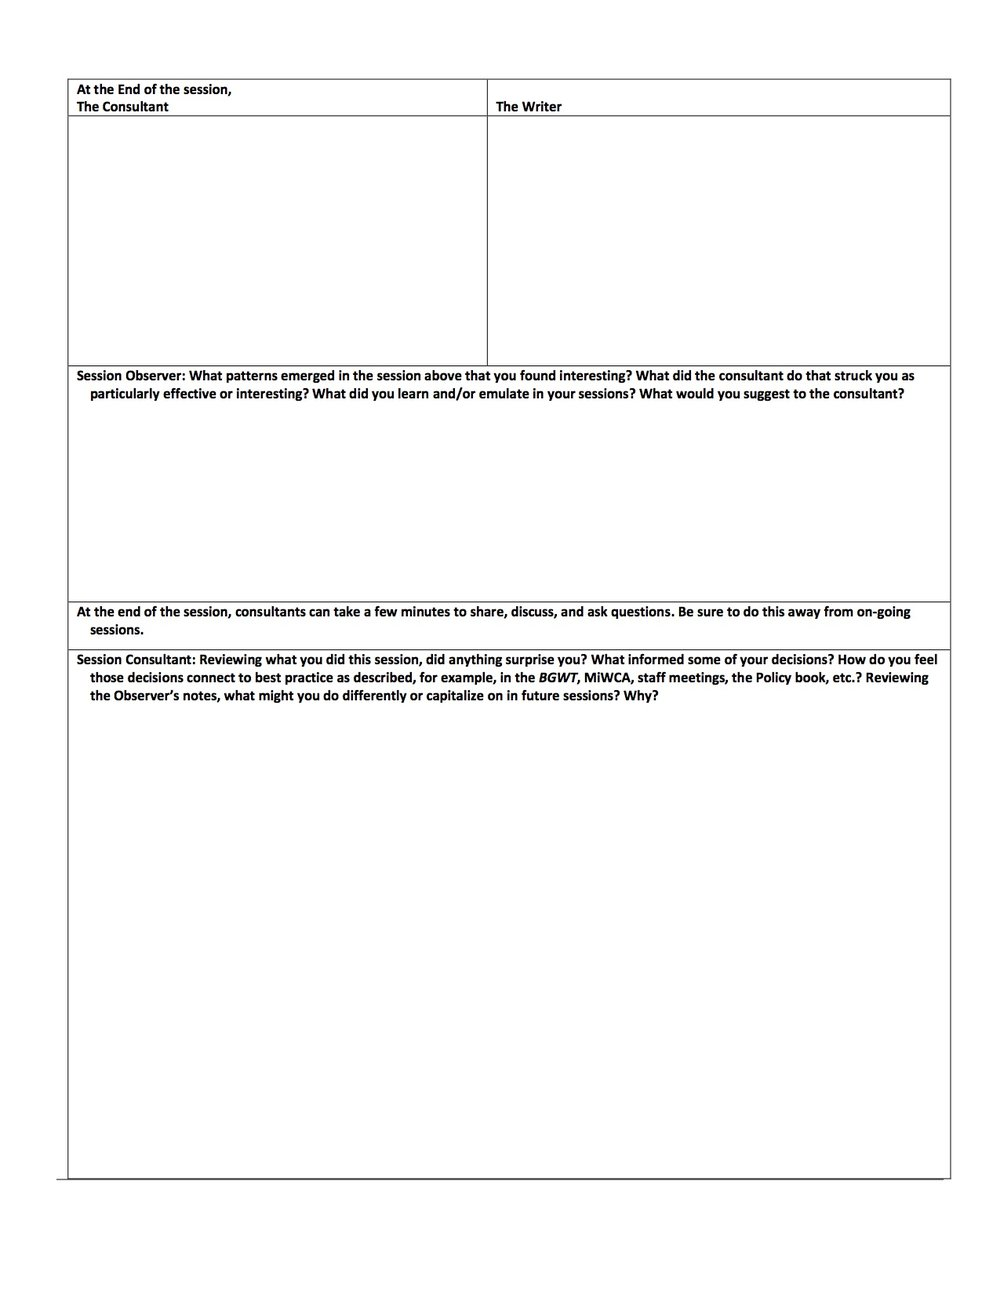 CMU form 4.jpg